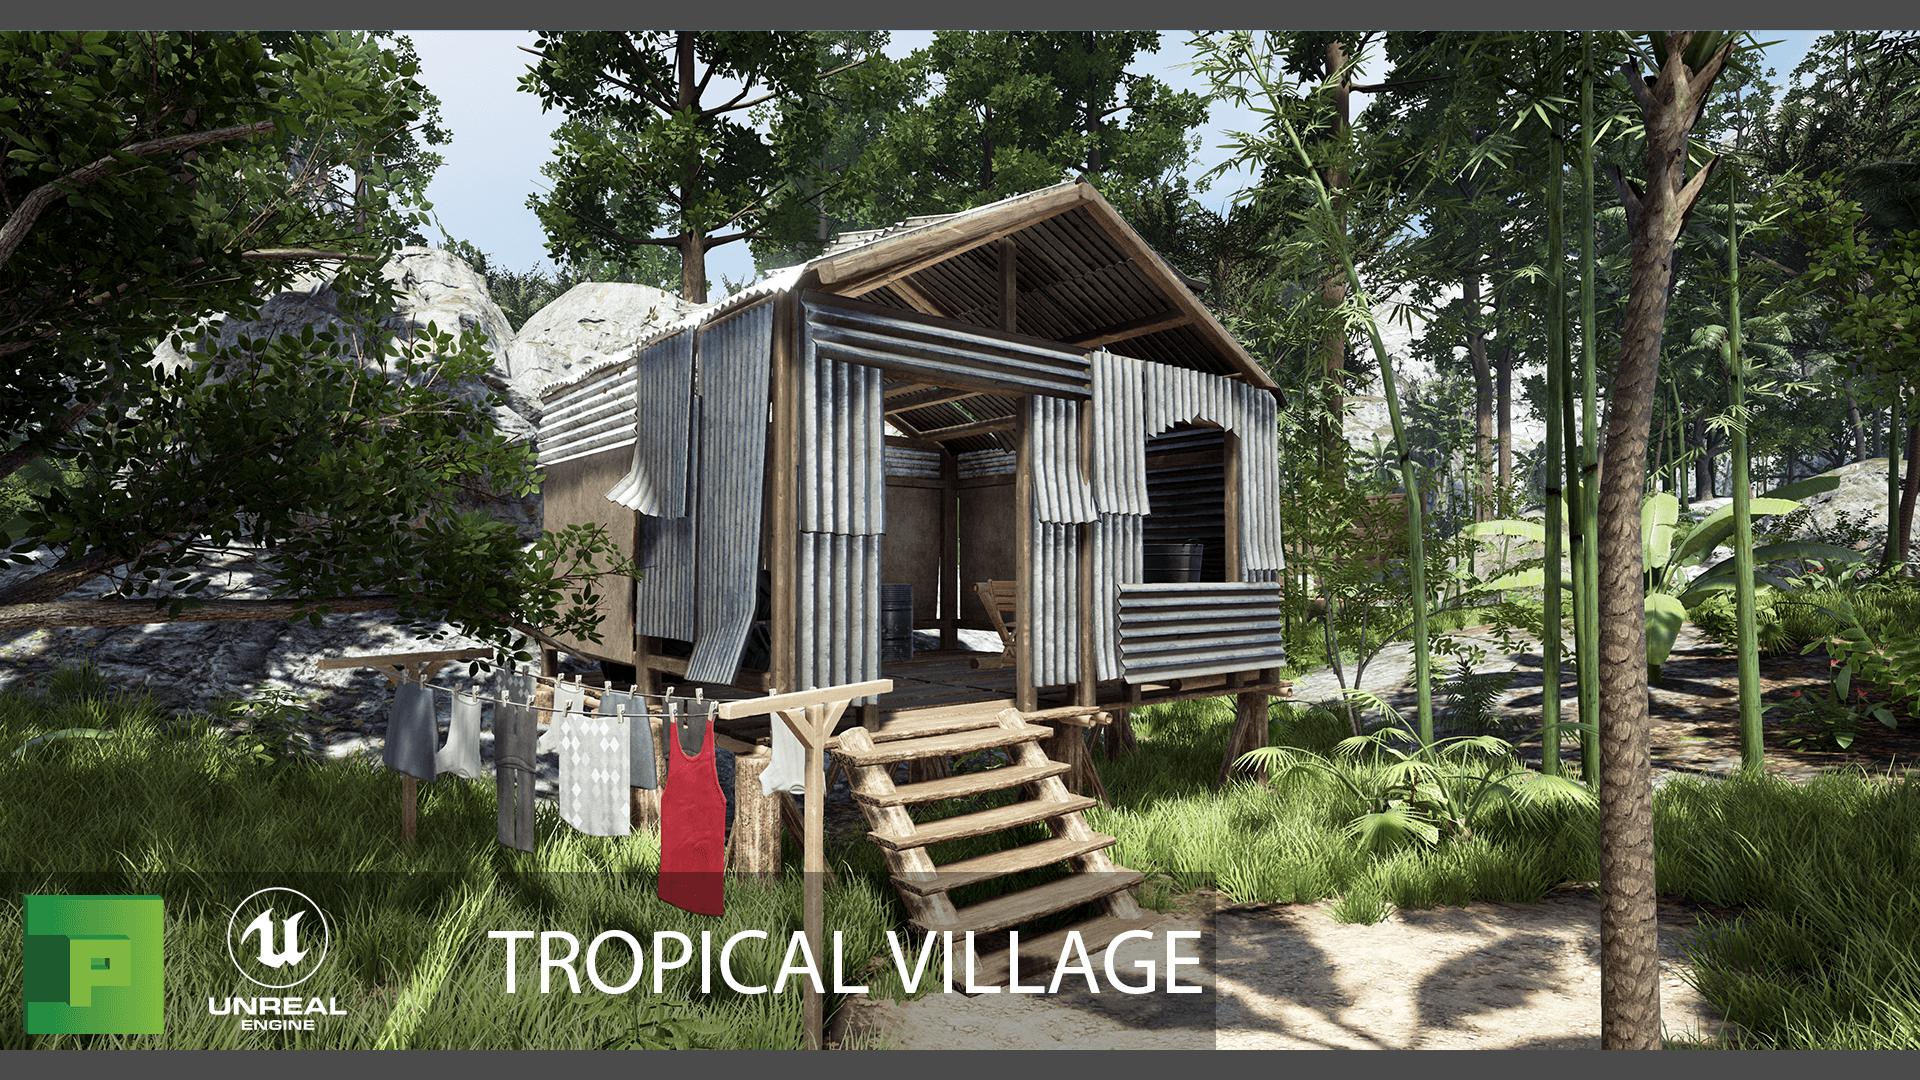 TropicalVillage_07